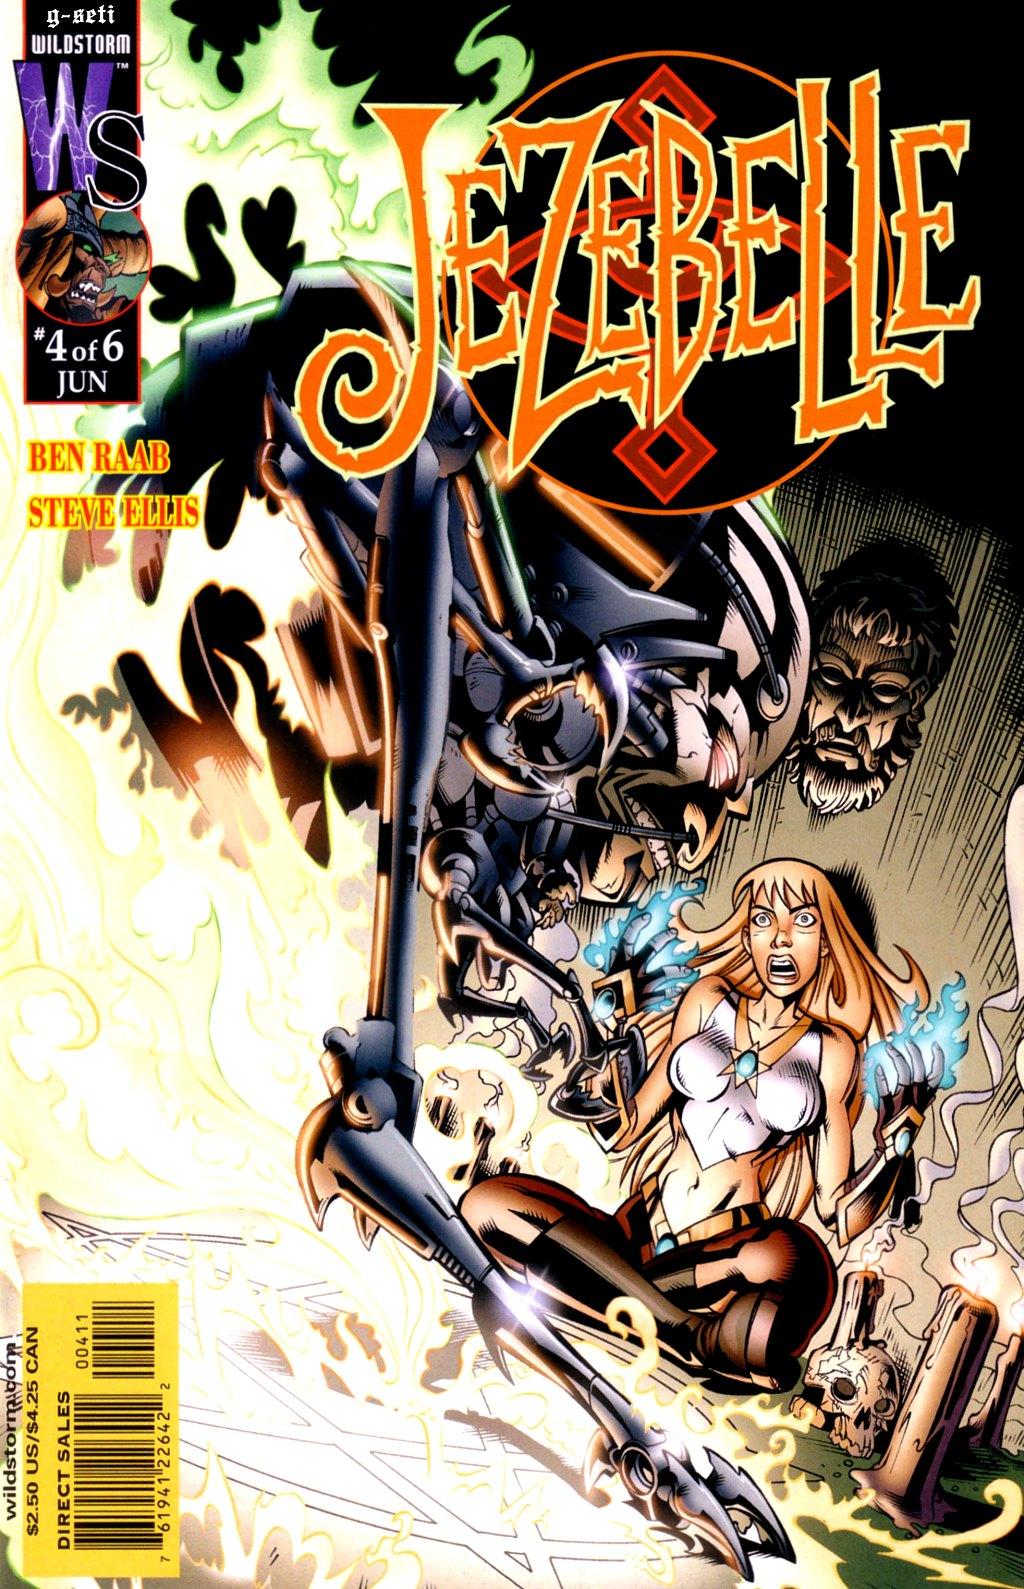 Read online Jezebelle comic -  Issue #4 - 1